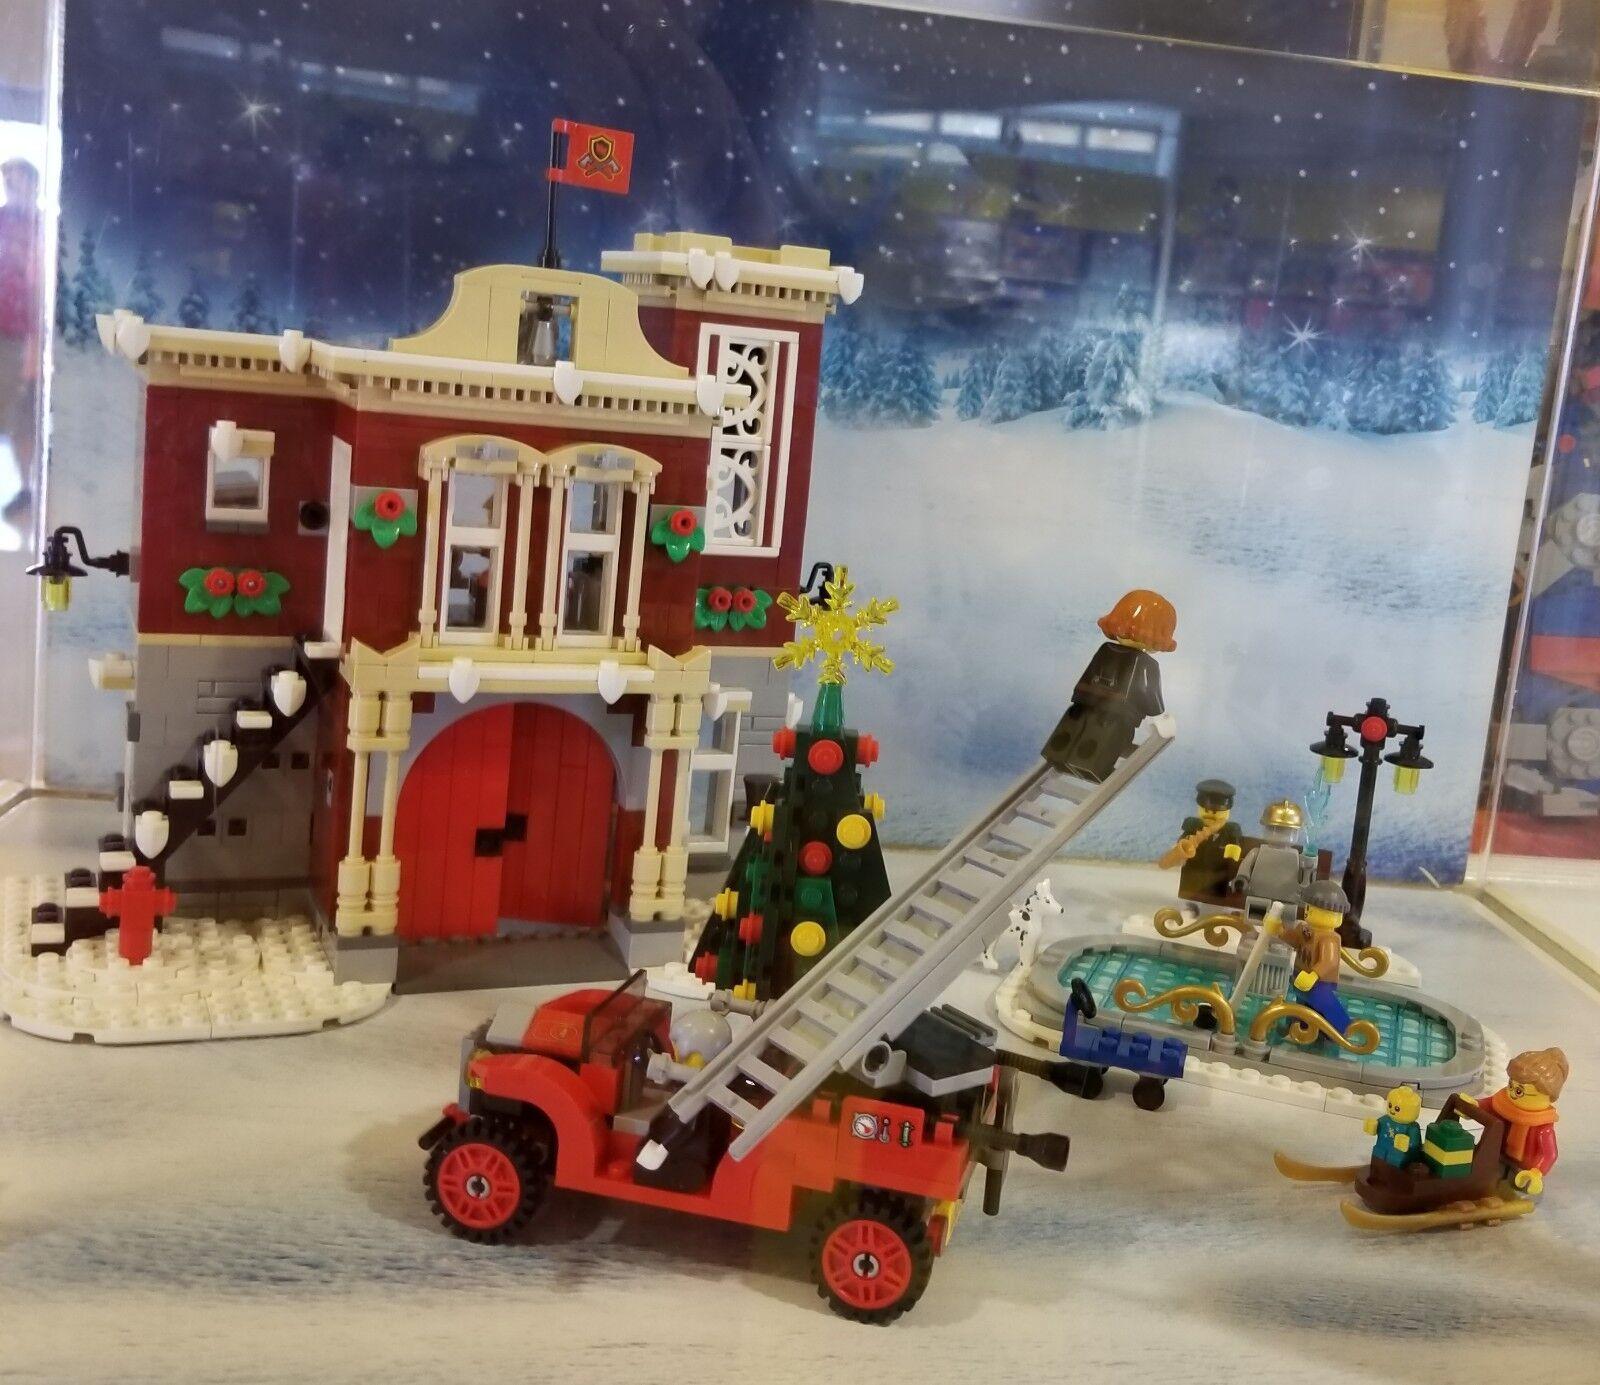 LEGO WINTER VILLAGE FIRE STATION 10263 CREATOR EXPERT